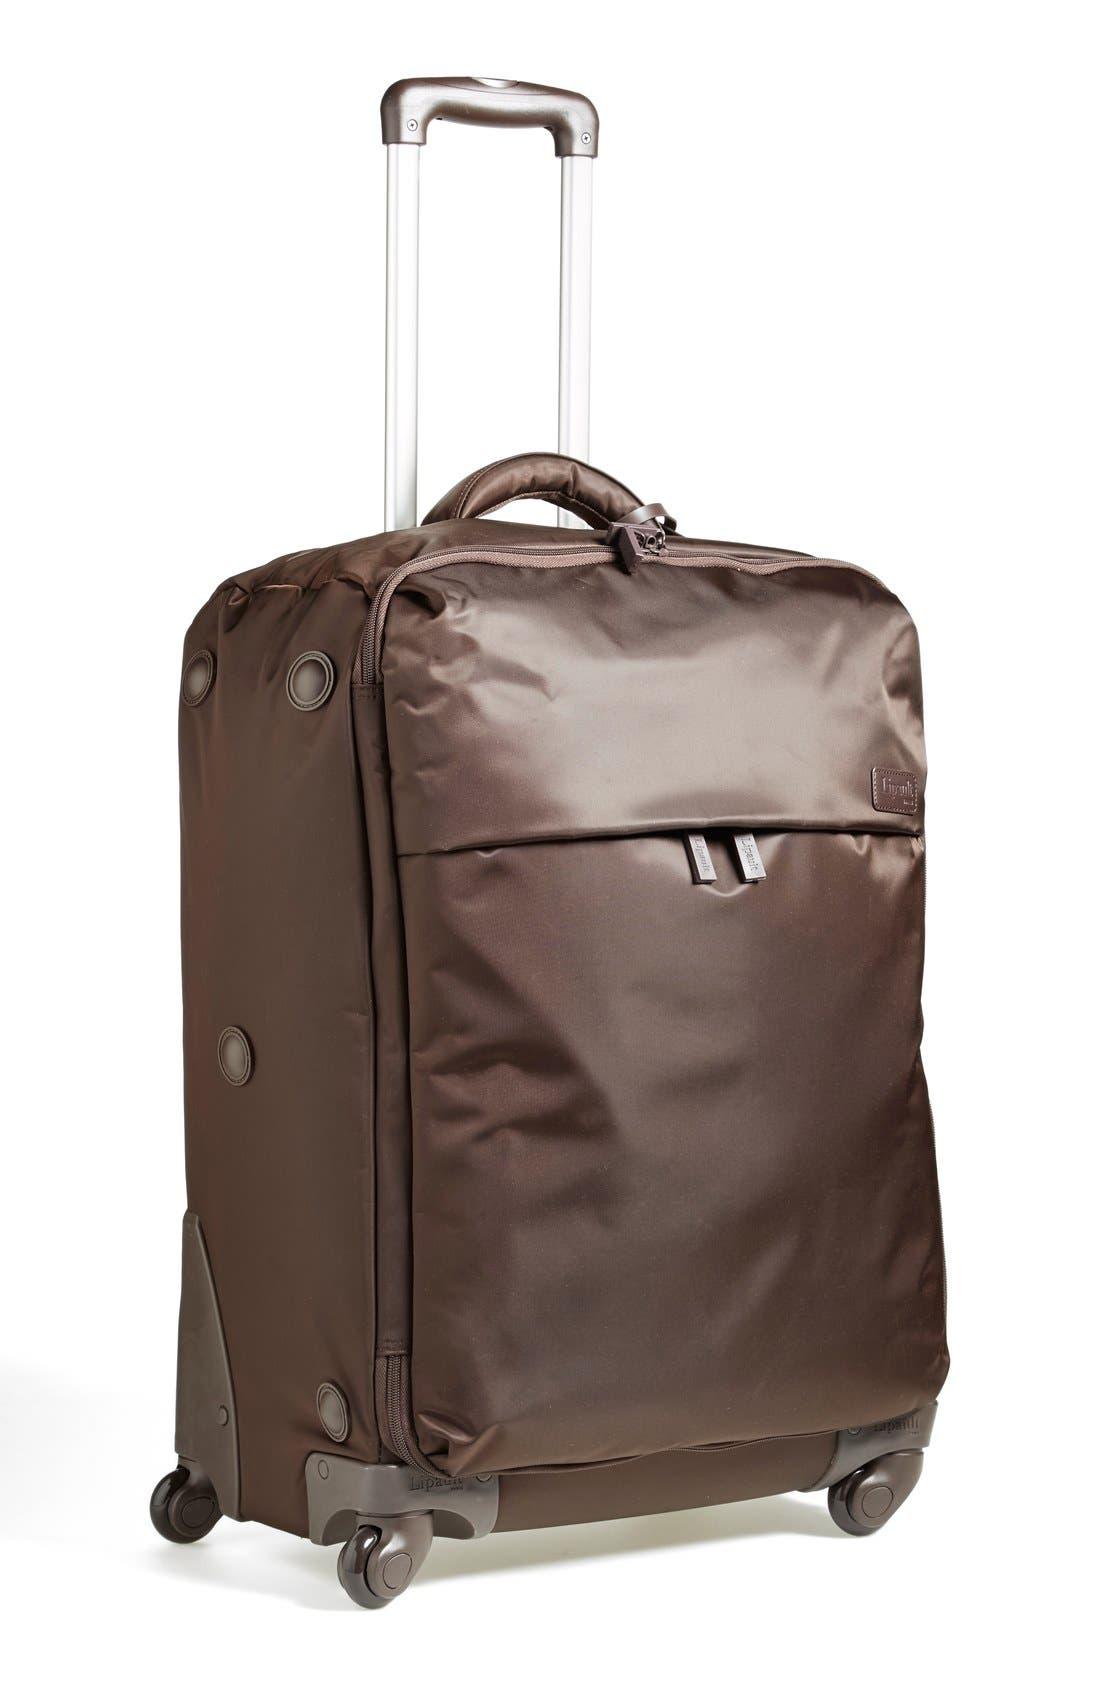 Main Image - LIPAULT Paris 4-Wheel Packing Case (25 Inch)